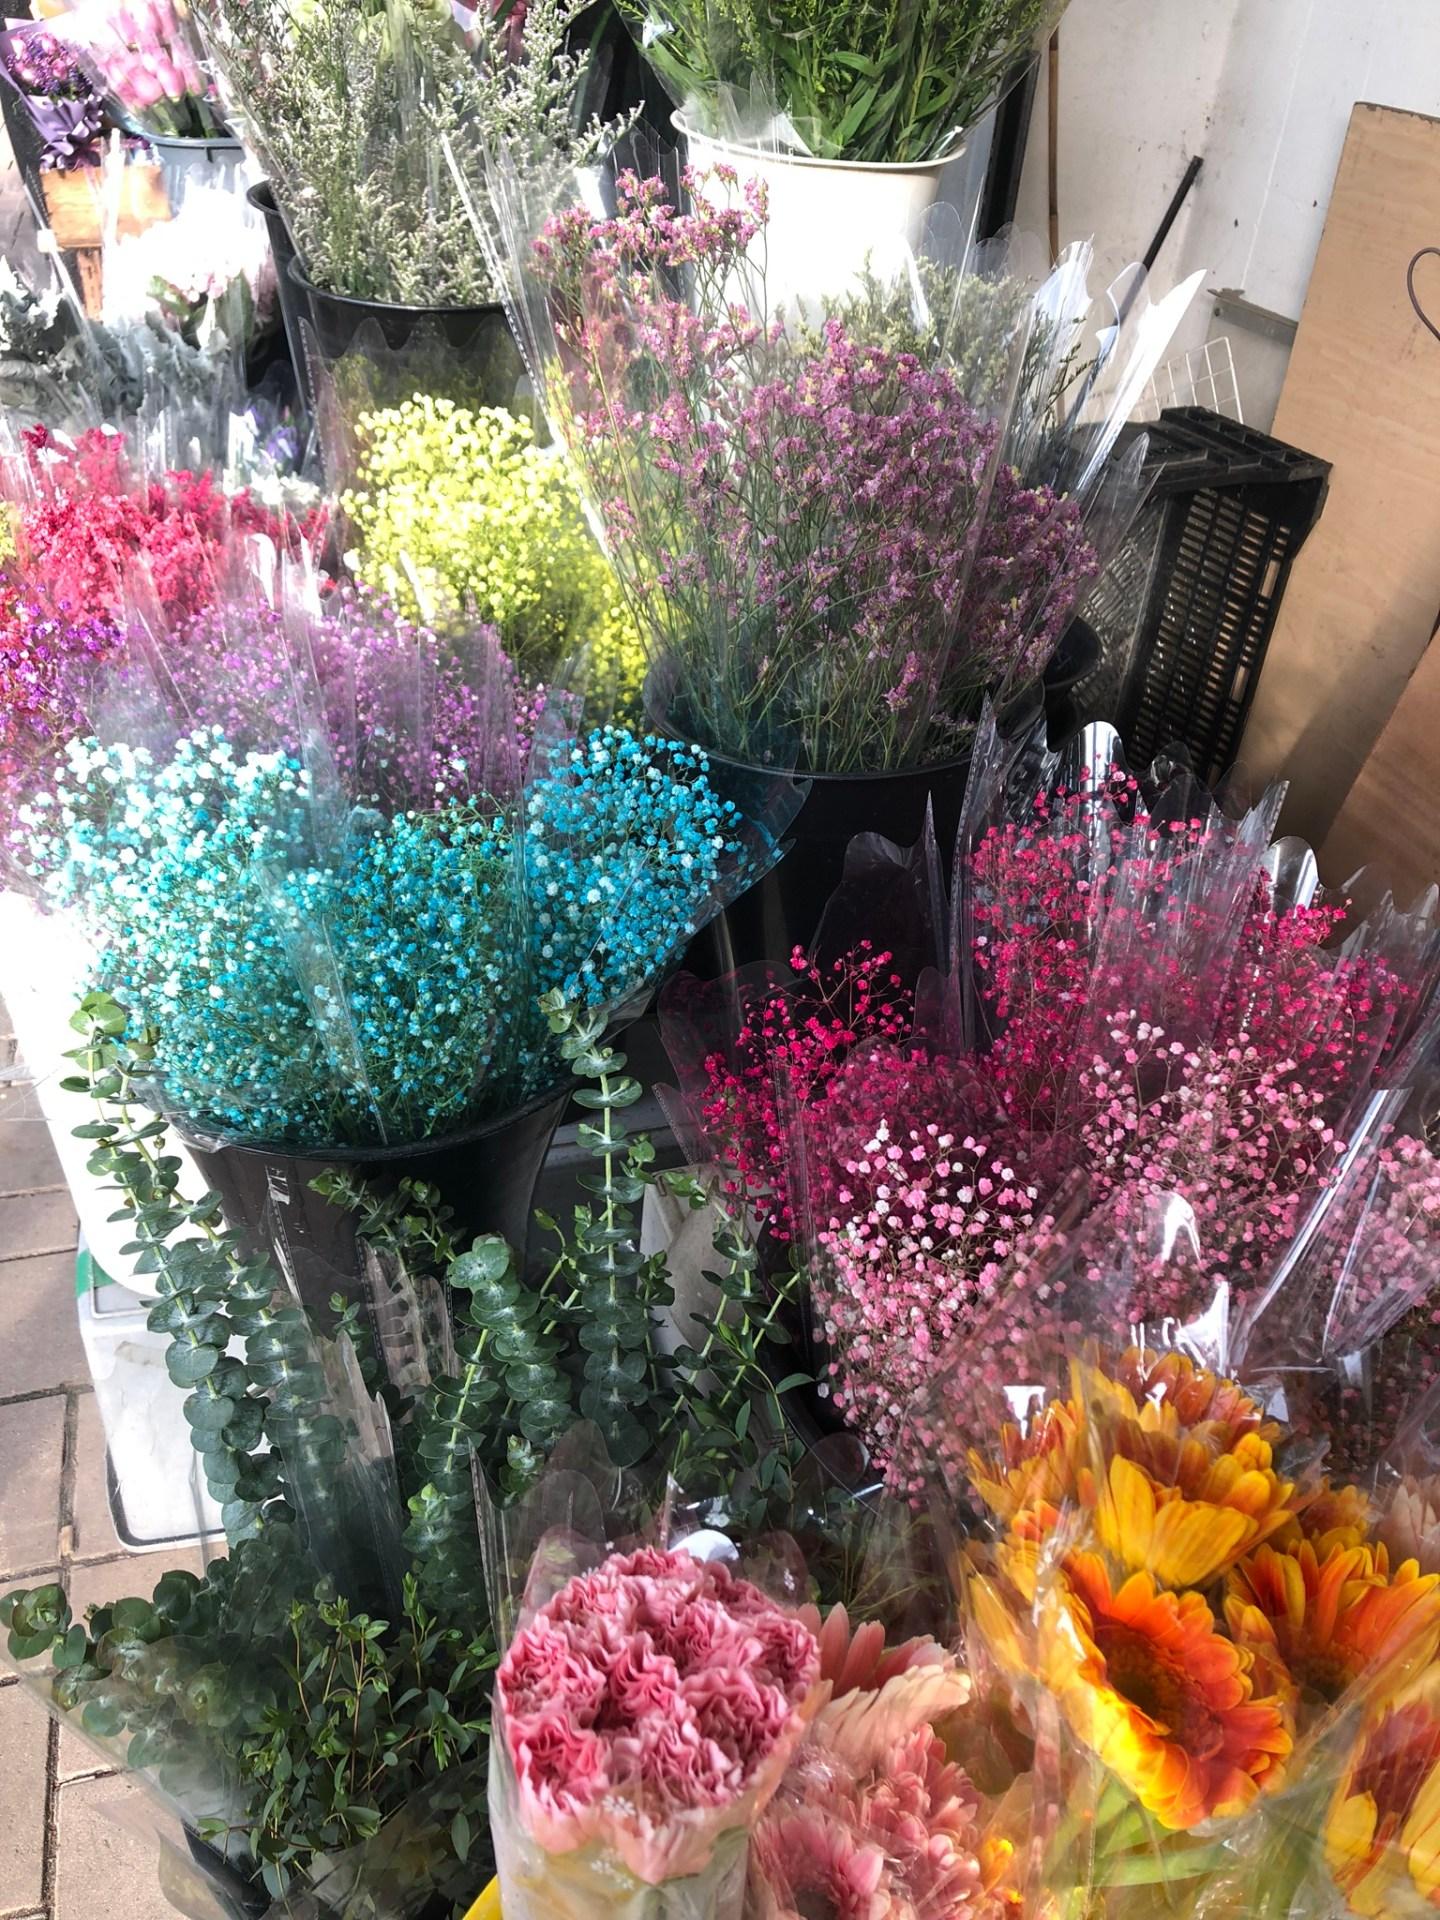 Bouquets at Hong Kong Flower Market